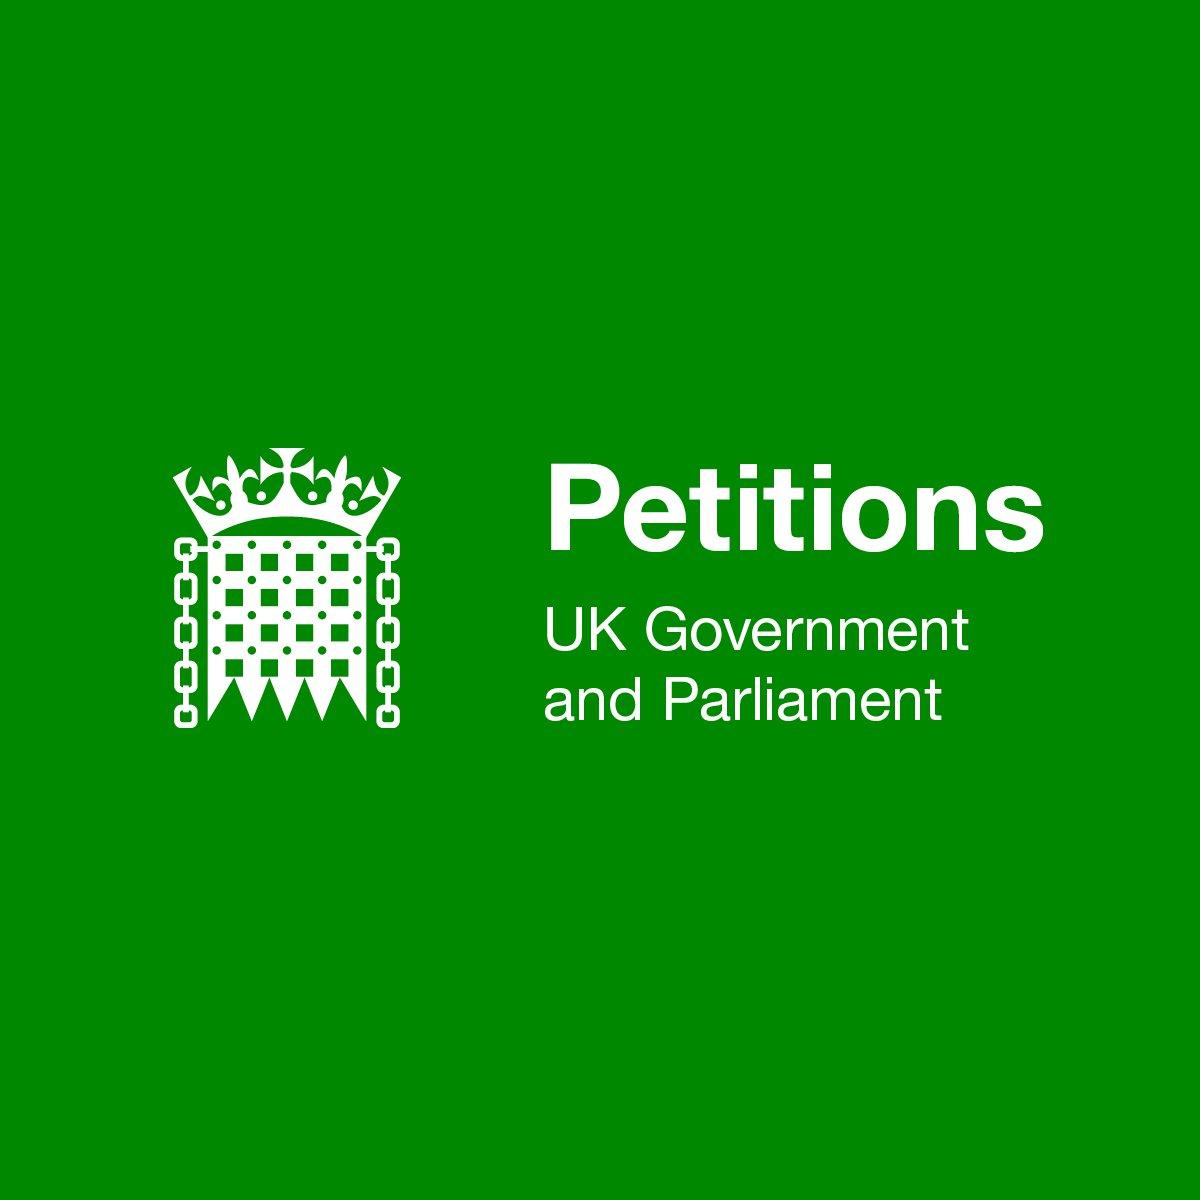 UK USERS: PETITION TO LEGALISE MARIJUANA FOR RECREATIONAL USE